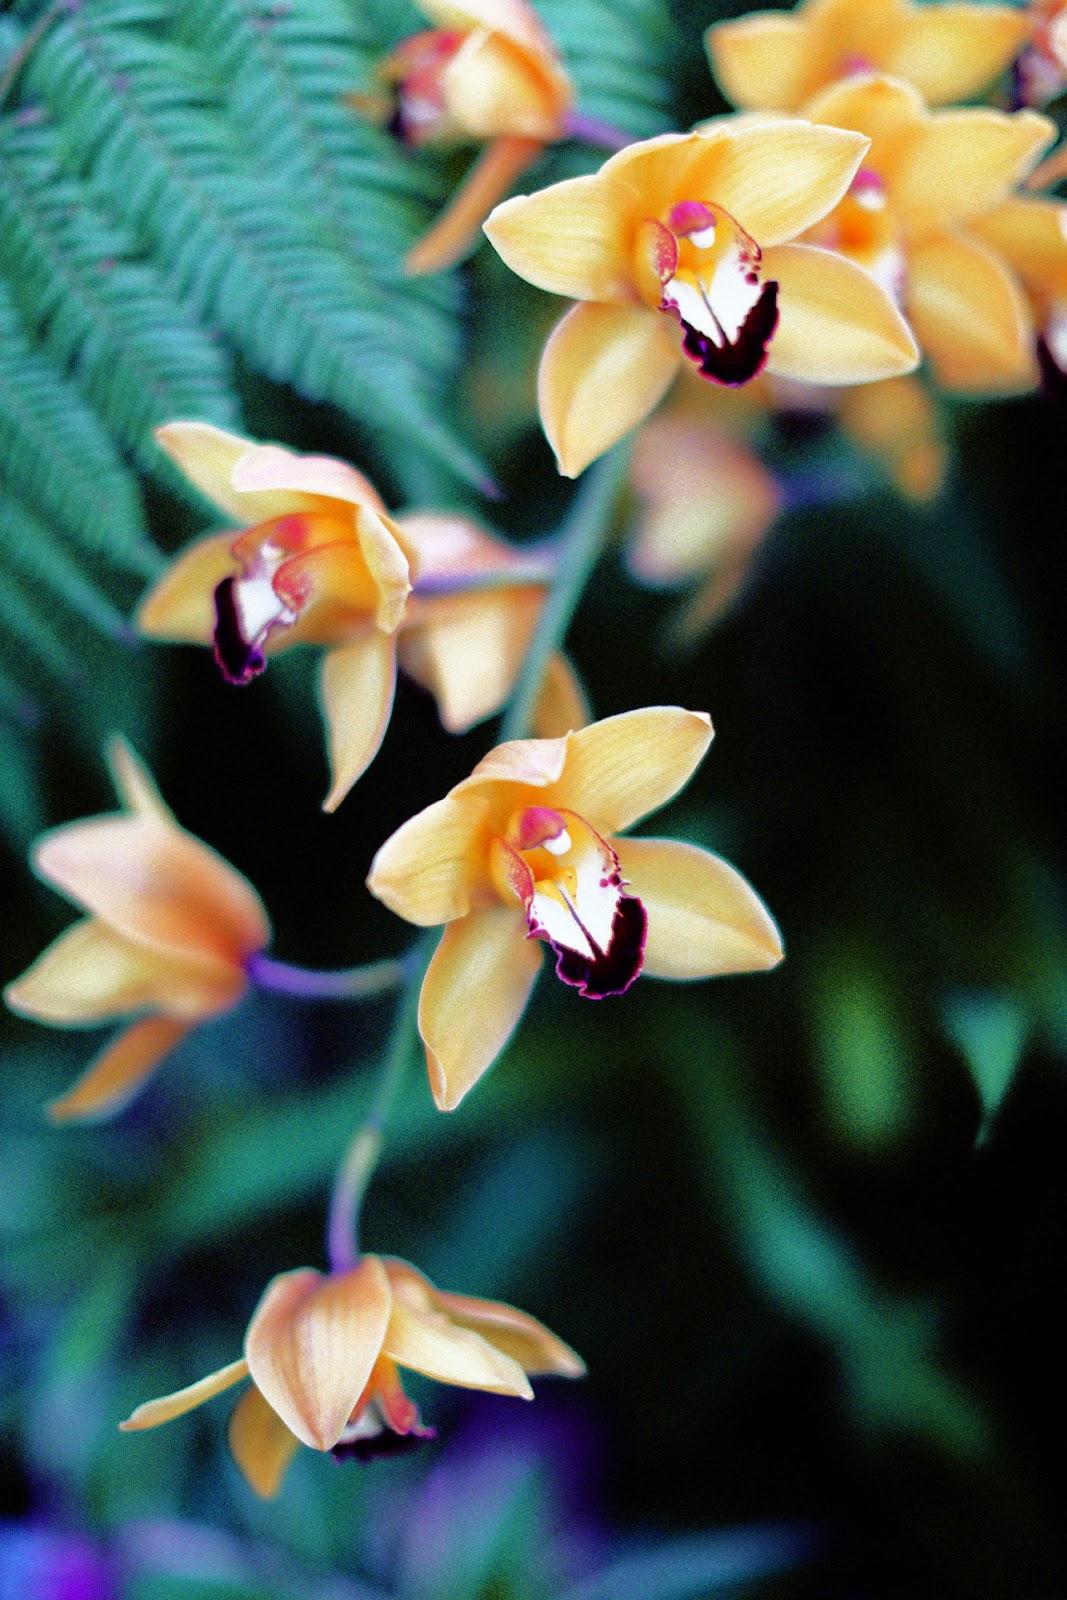 sunday,a beach life, tumblr,orchidées,fleurs